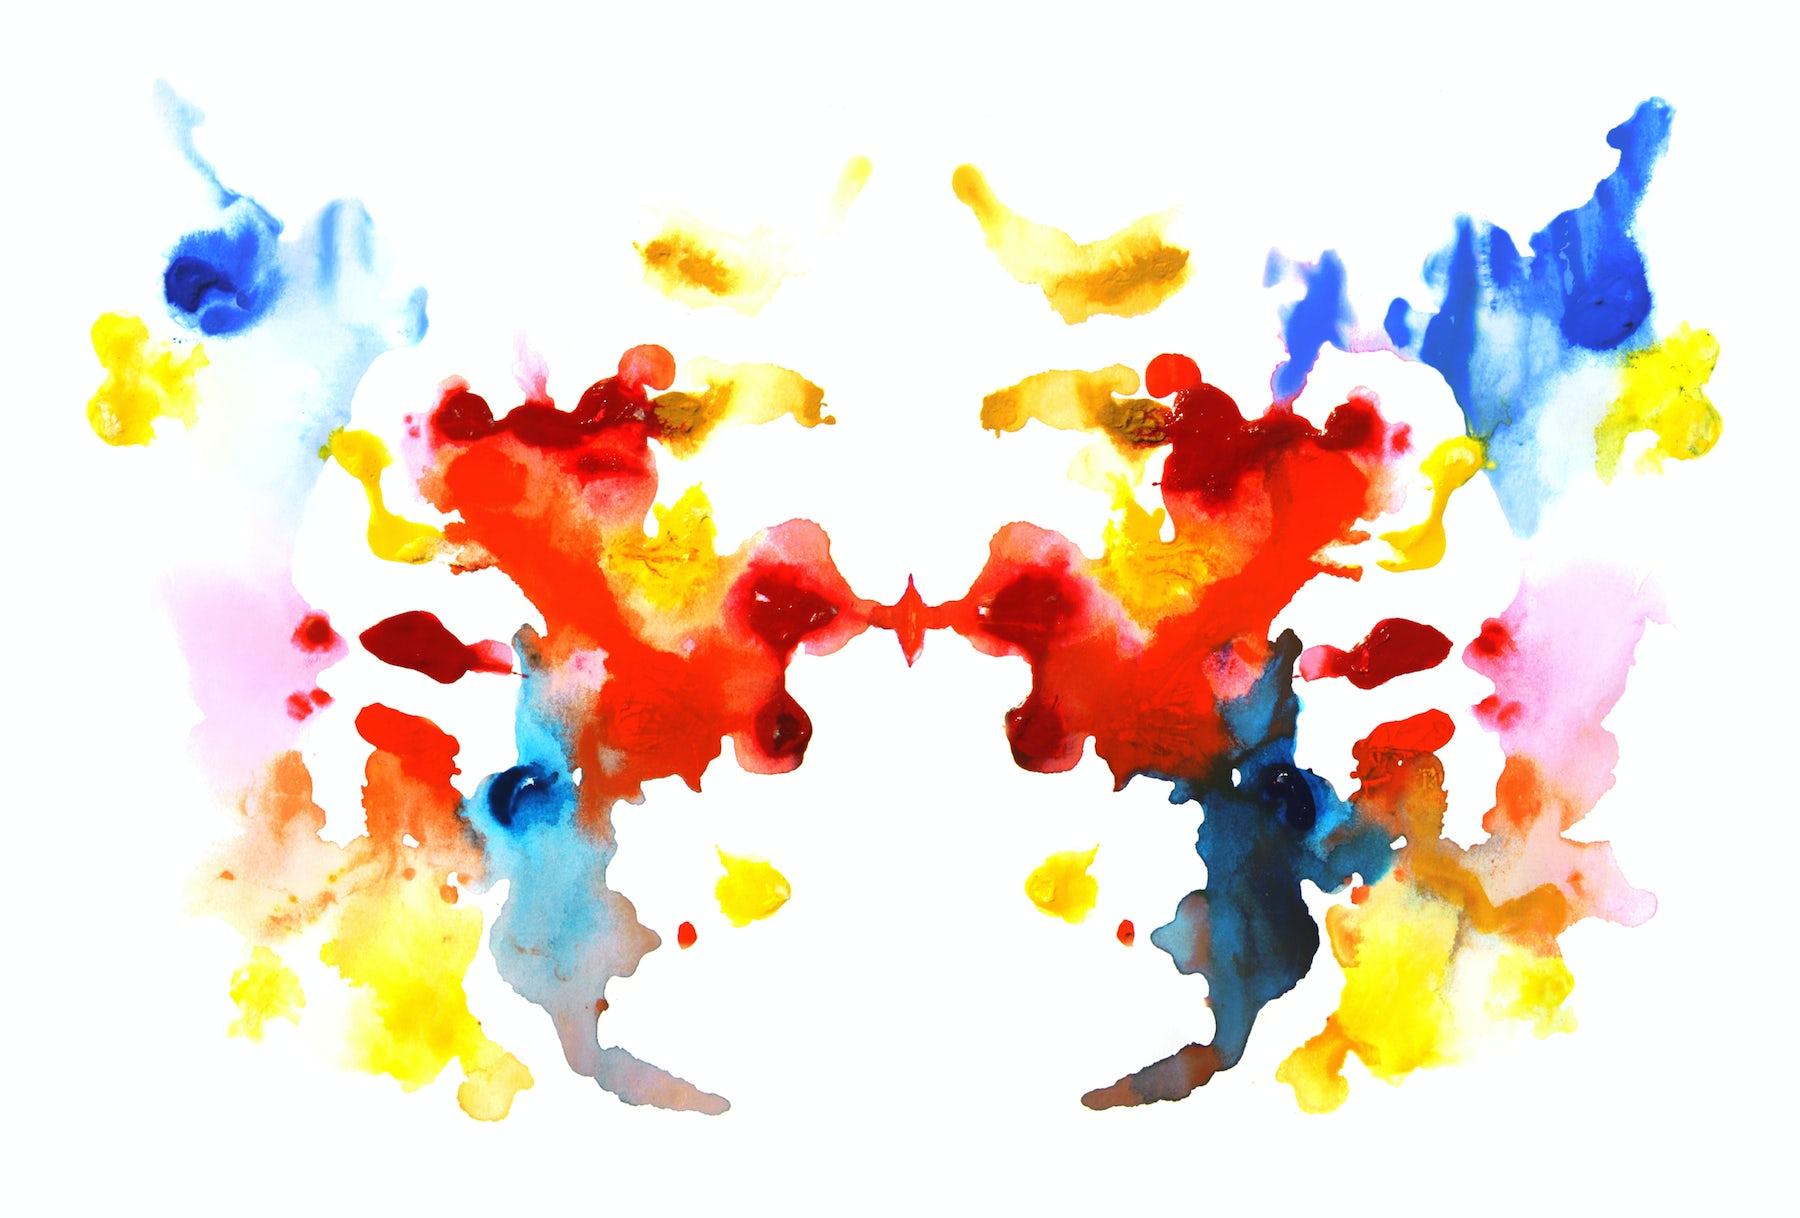 Rorschach test | Source: Shutterstock